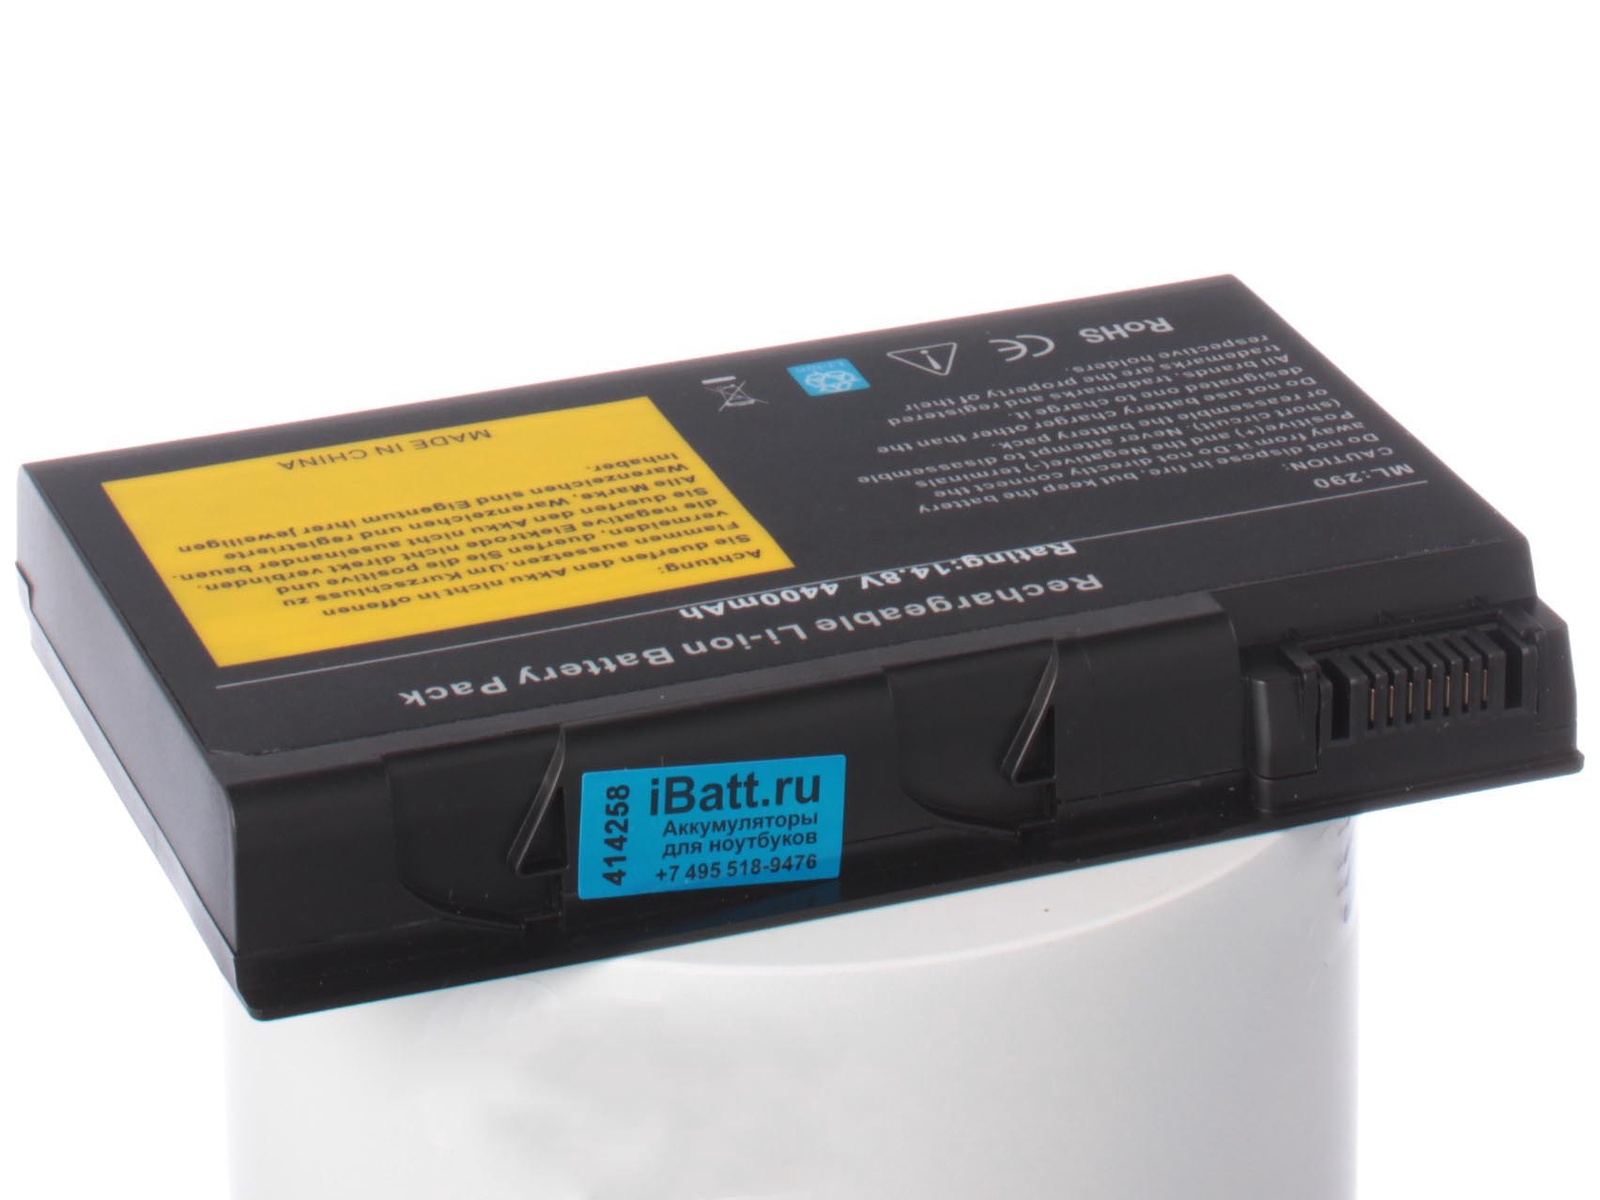 Фото - Аккумулятор для ноутбука iBatt Acer BATCL50L, BTP-04, BATCL50L4 аккумулятор